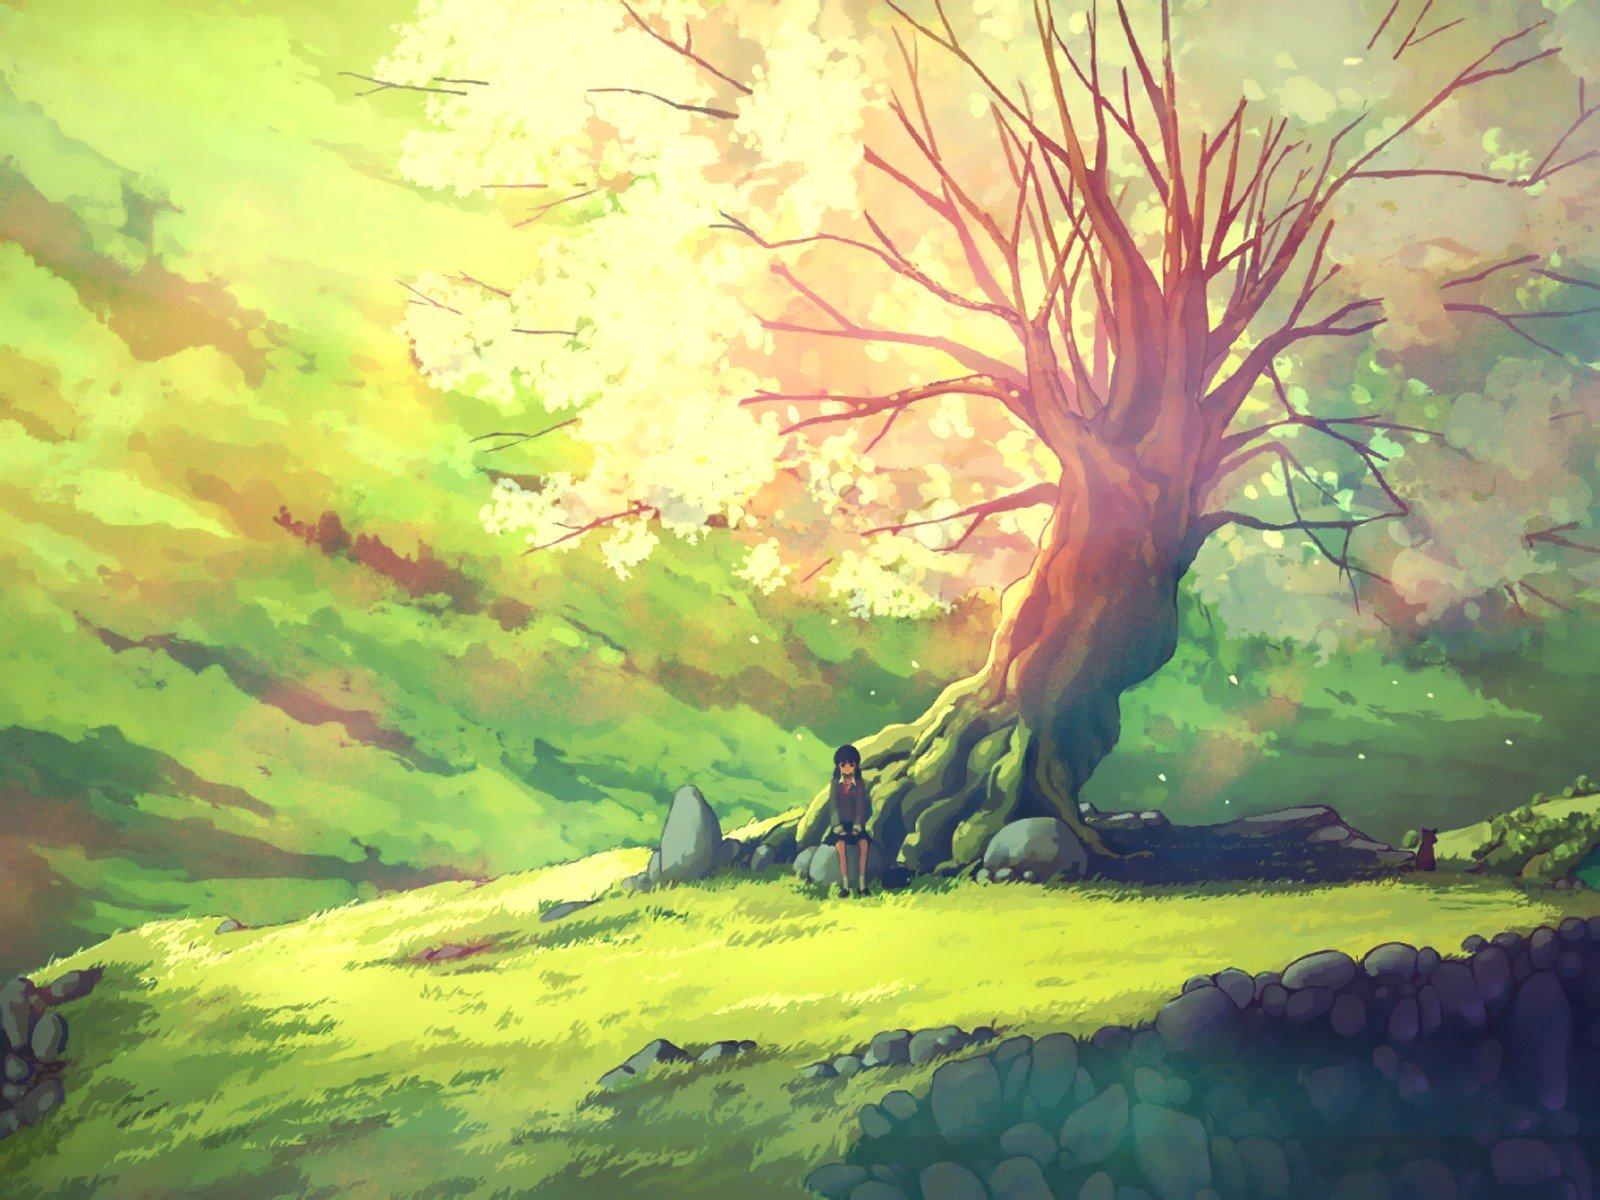 Sad Girl Sitting Alone Hd Wallpapers Nature Trees Scenic Anime Girls Wallpaper 1600x1200